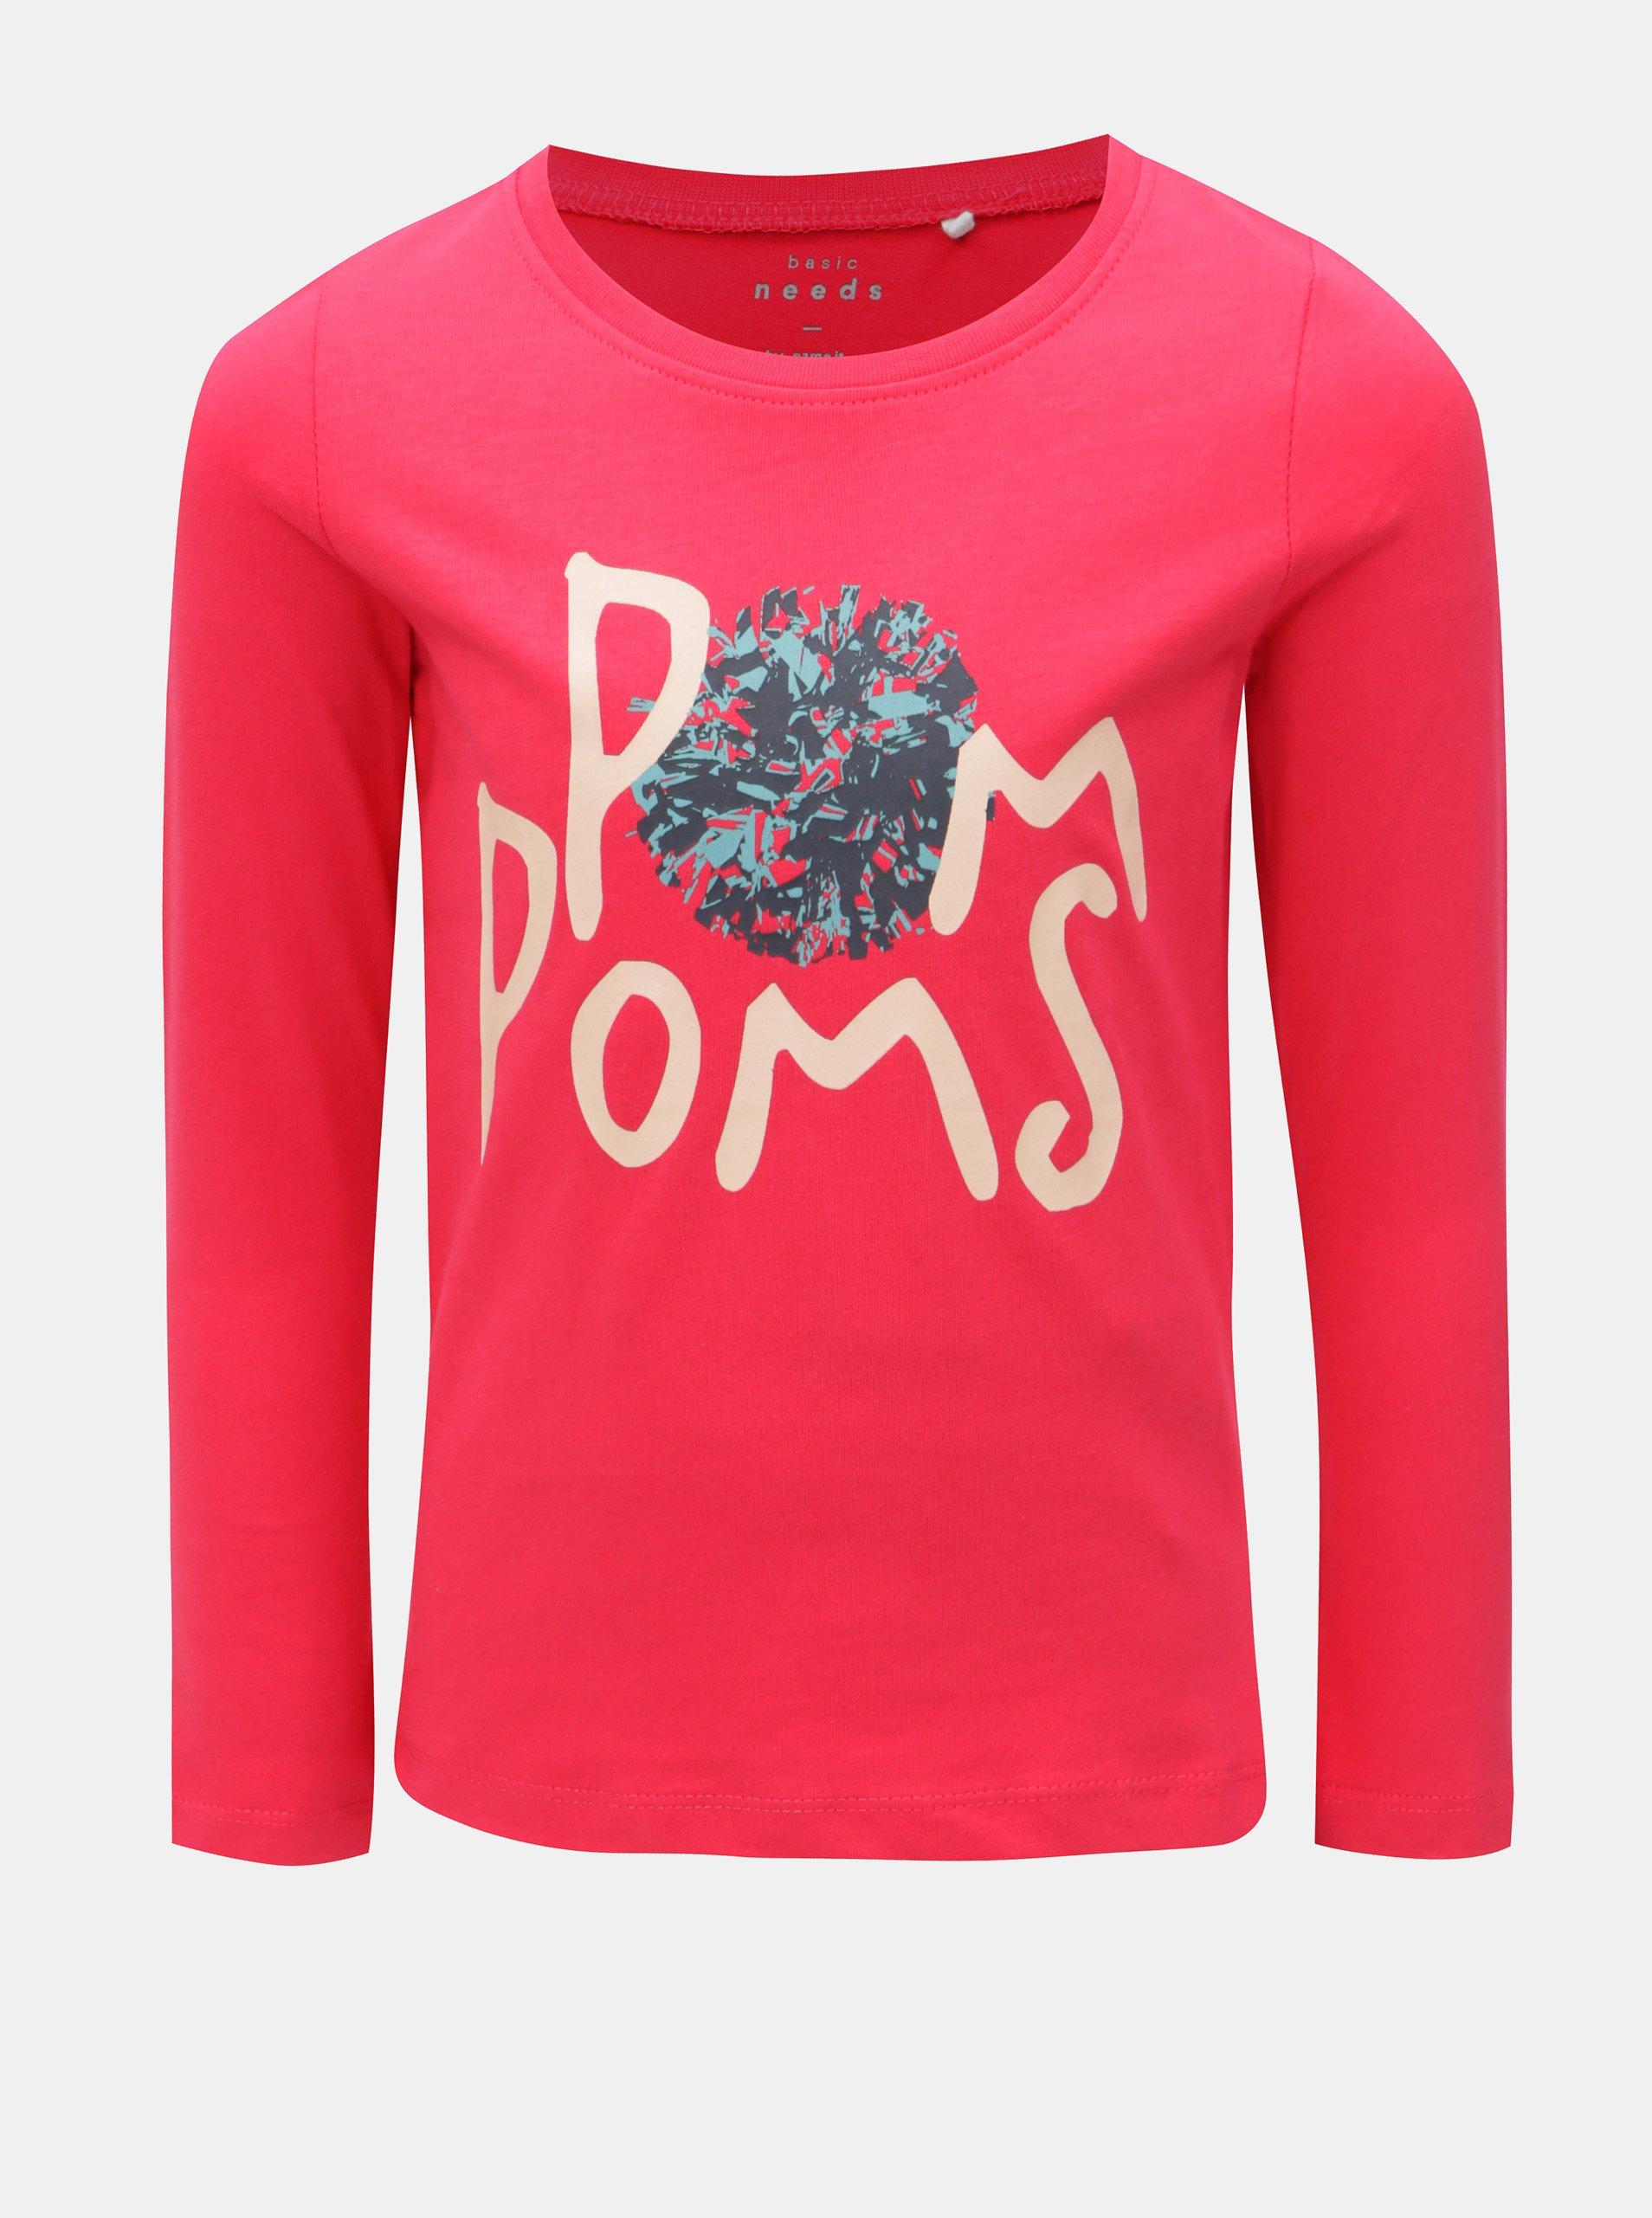 054db7bff8d6 Červené dievčenské tričko s dlhým rukávom Name it Veen